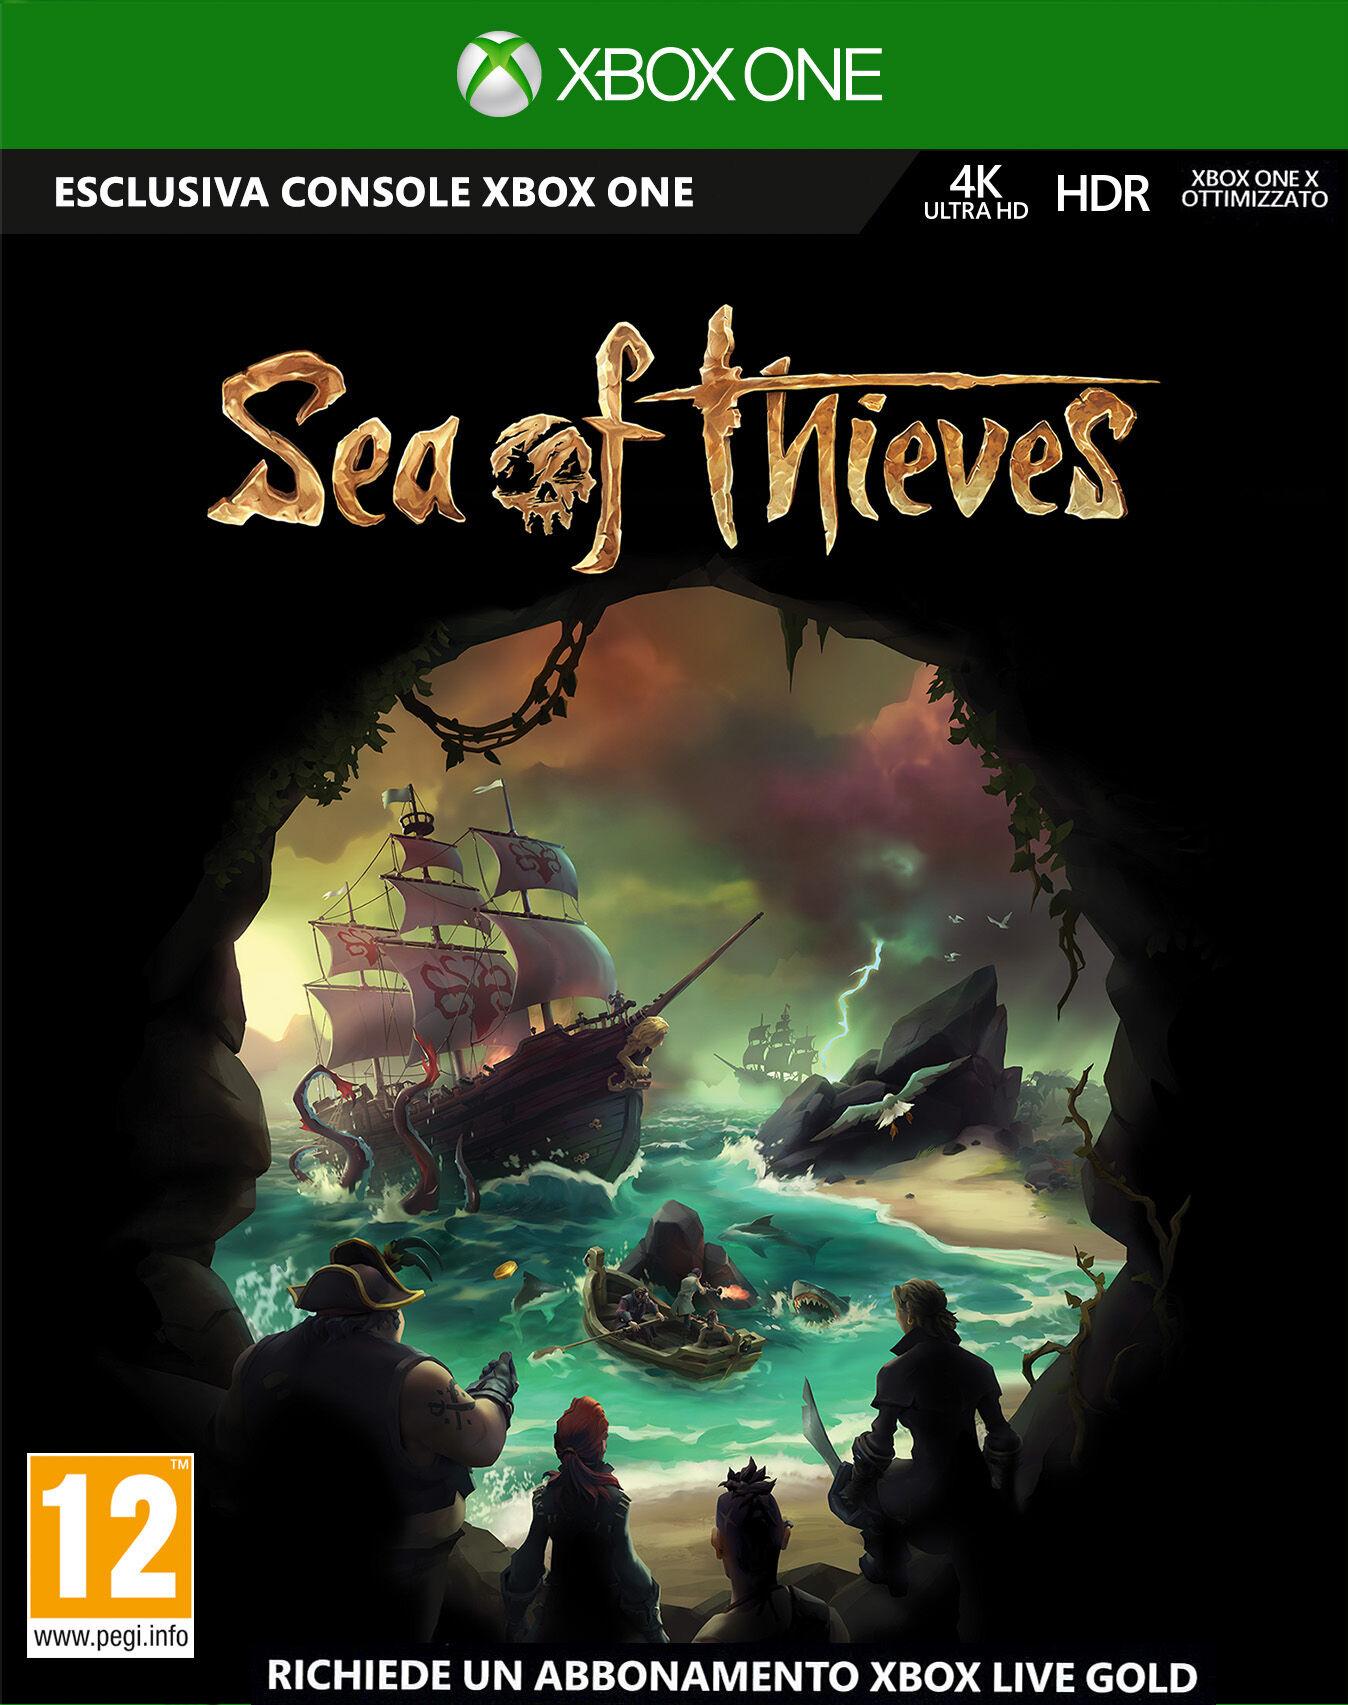 microsoft sea of thieves, xbox one videogioco basic tedesca, inglese, esp, francese, ita, portoghese, russo